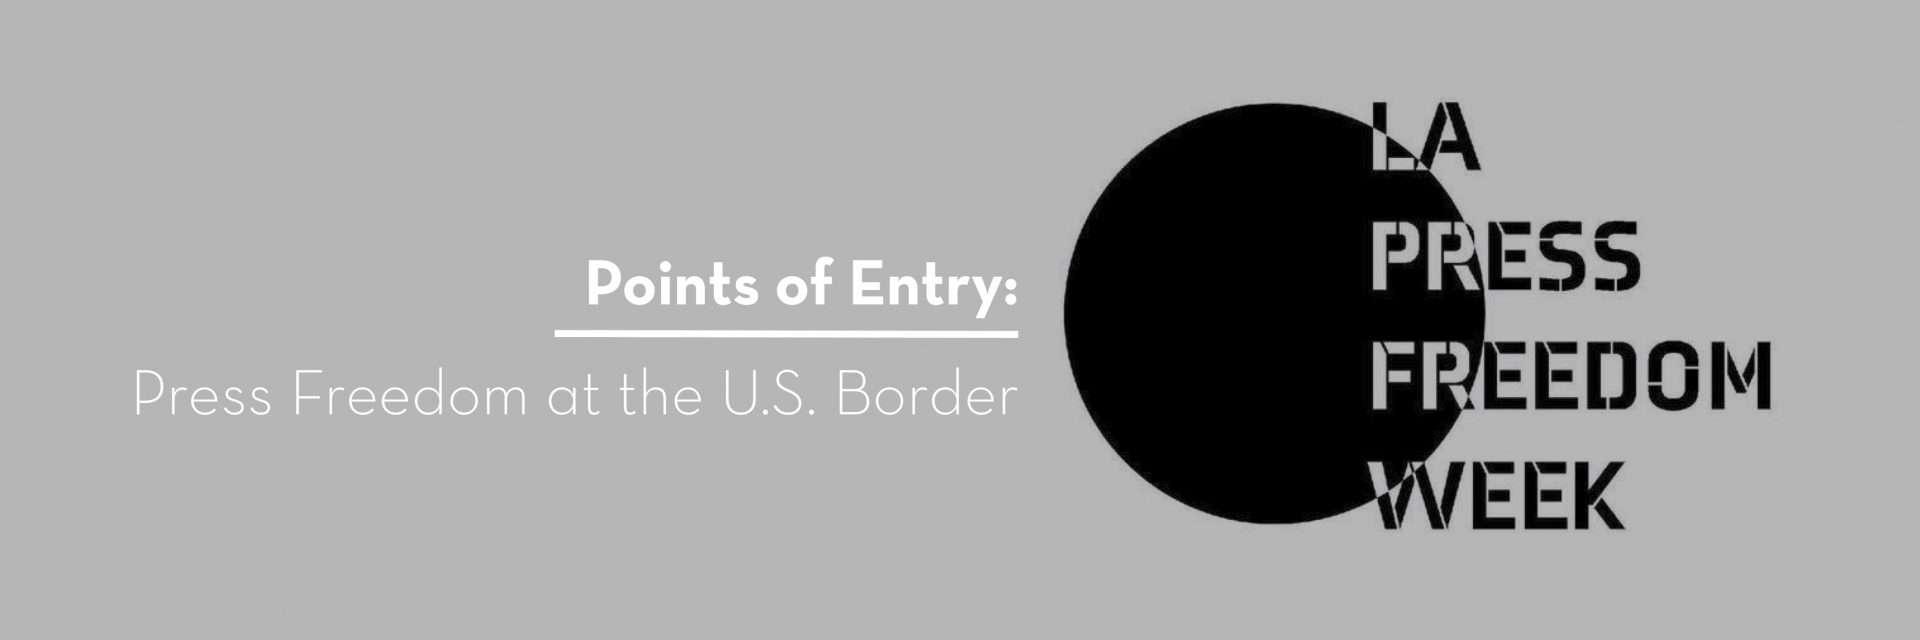 Points of Entry: LA Press Freedom Week